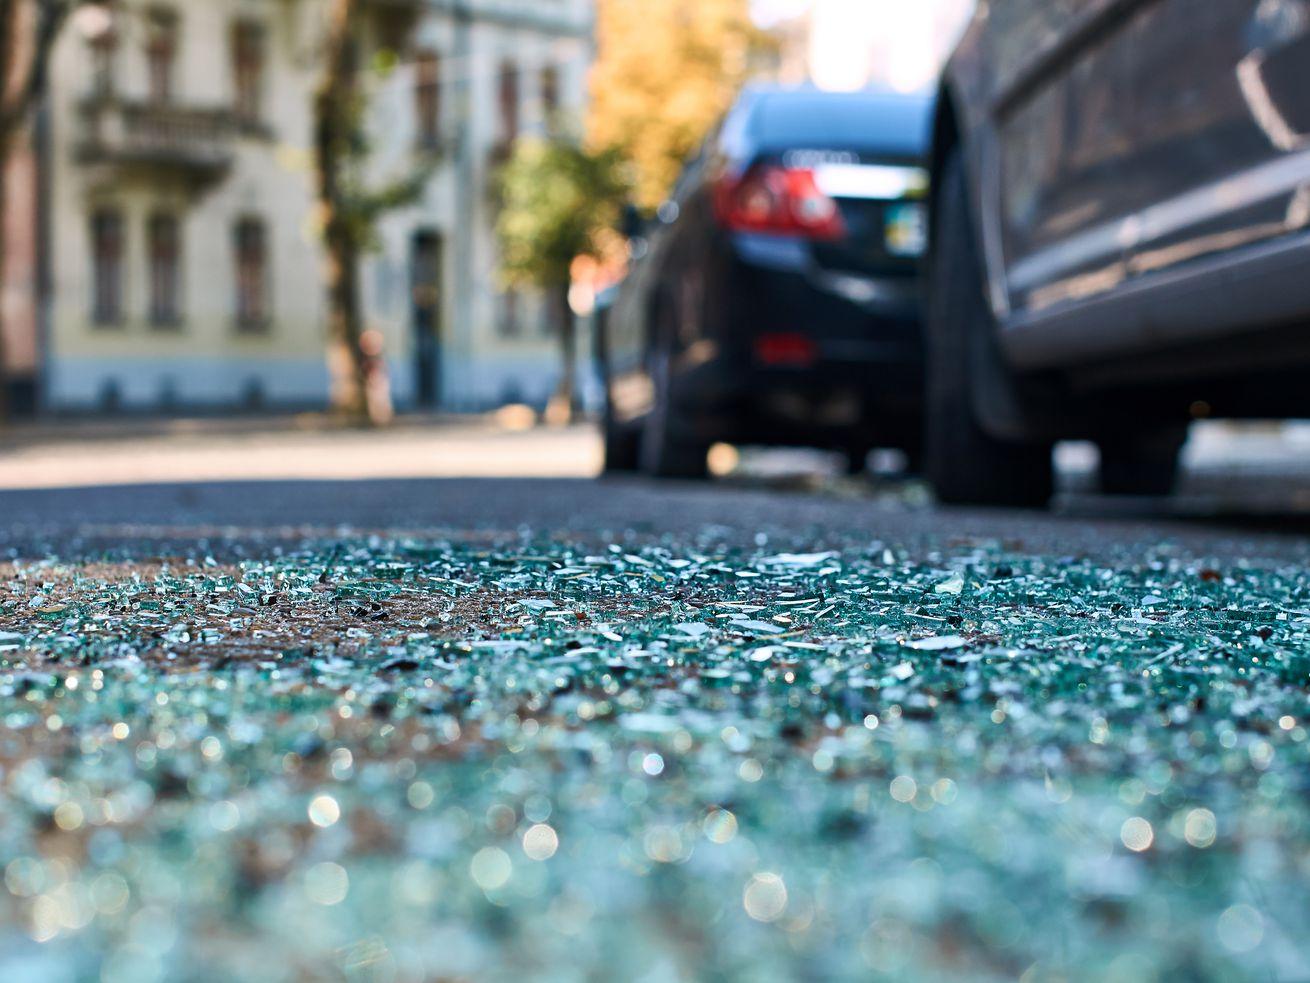 Man dies days after Bolingbrook crash